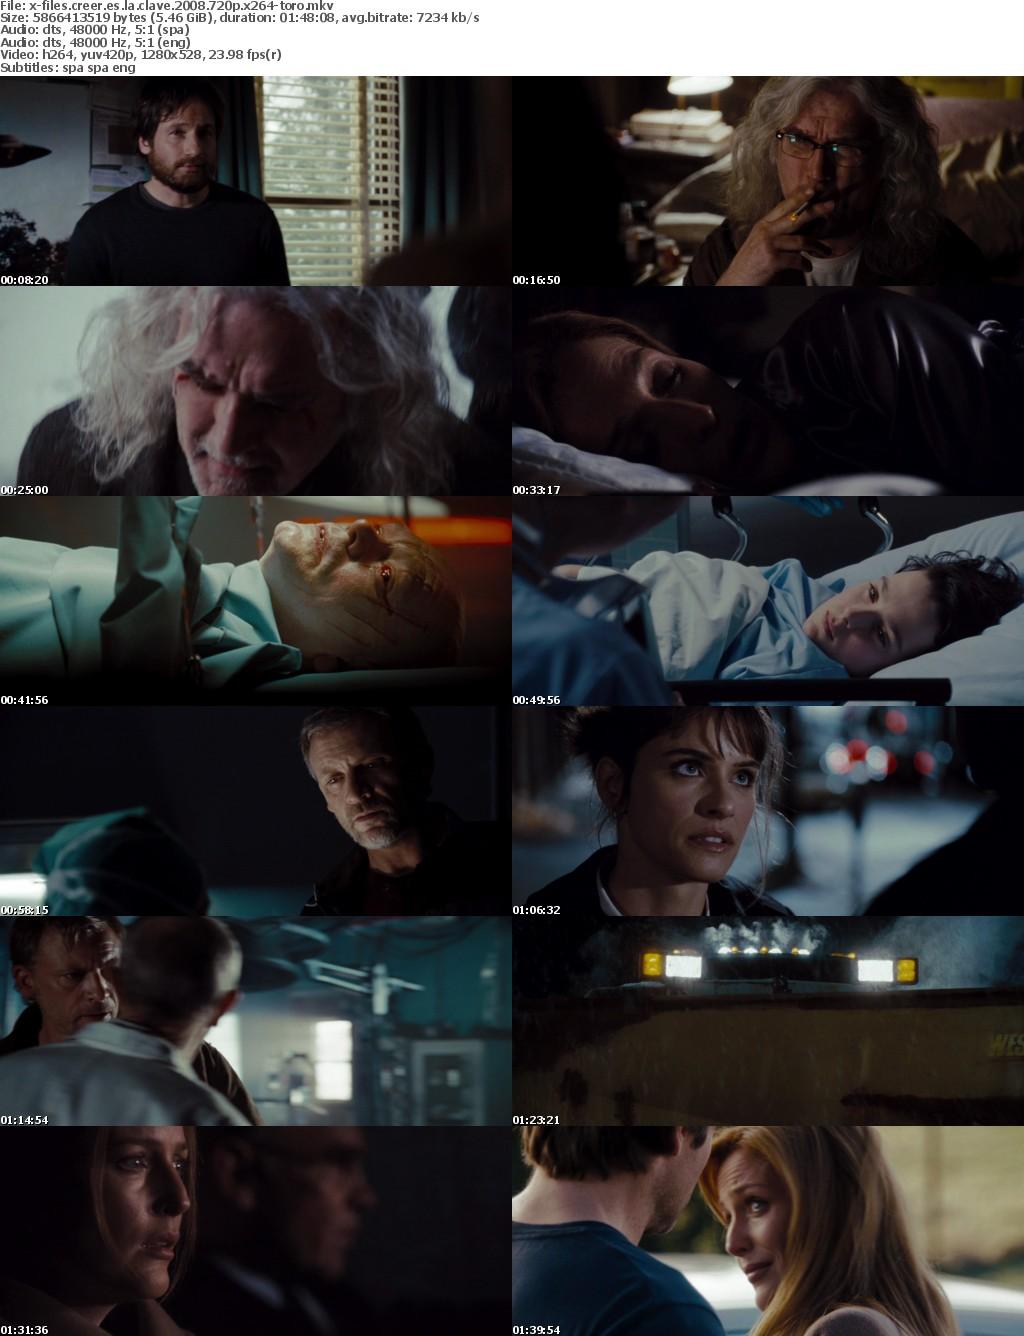 X-Files Creer Es La Clave 2008 SPANiSH MULTi 720p BluRay x264-TORO